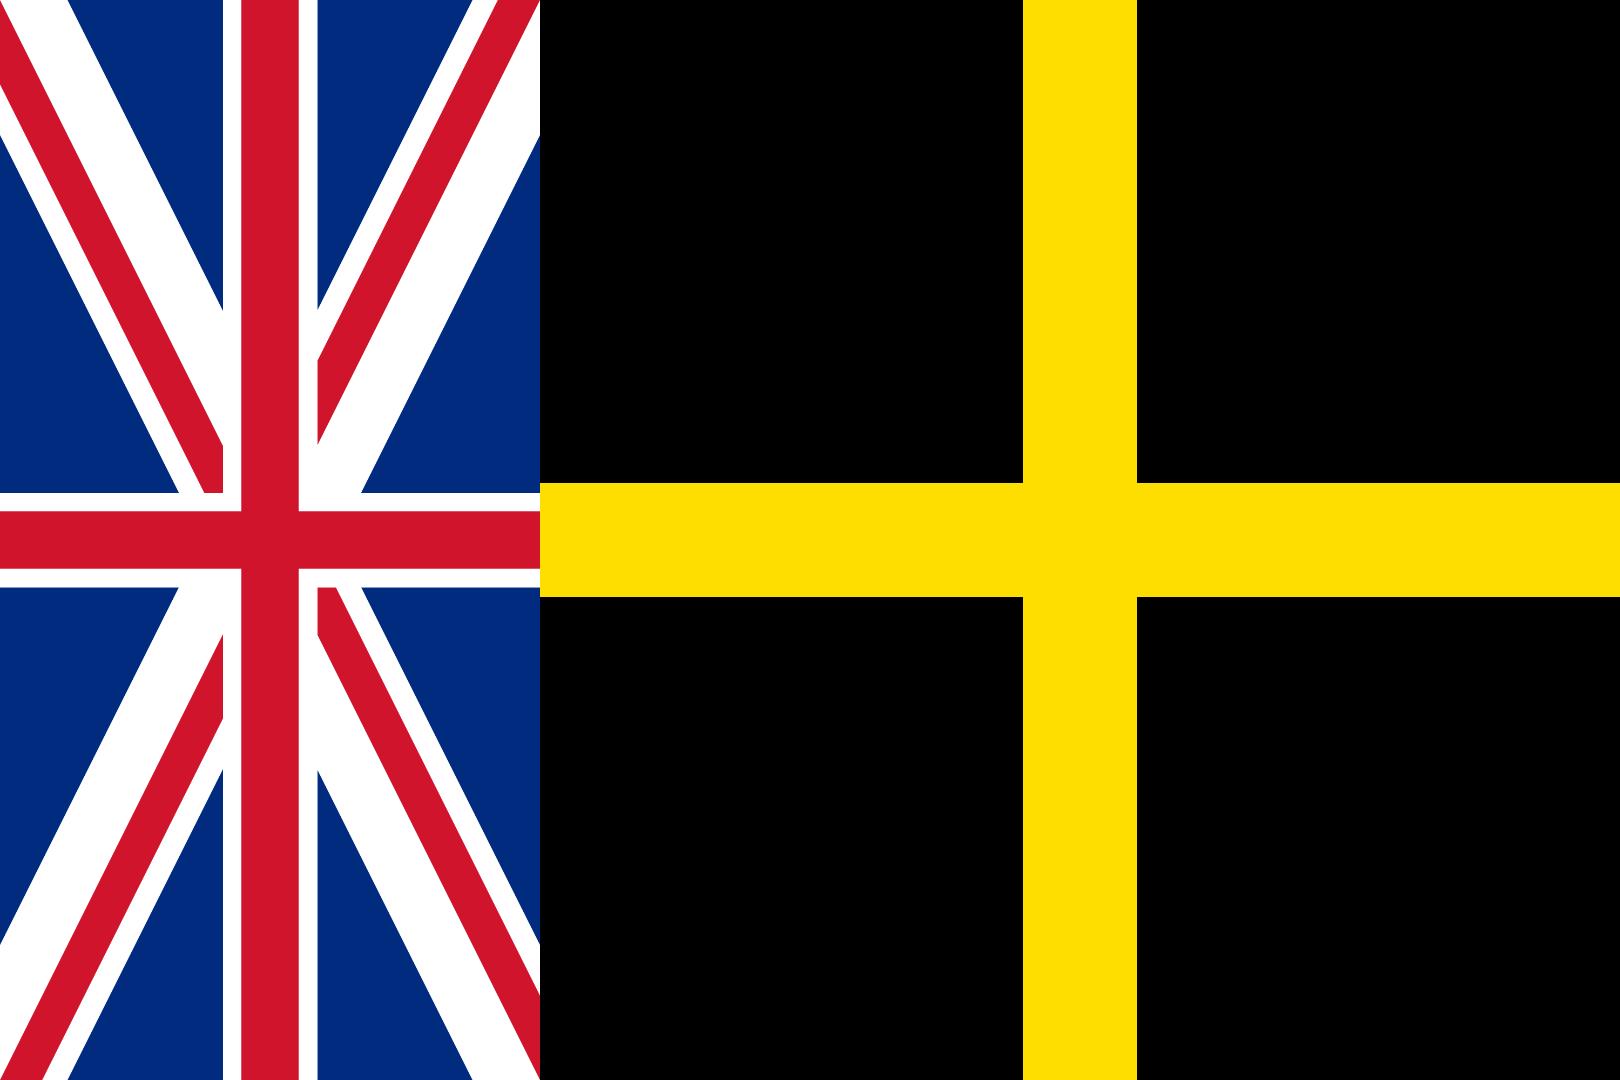 UK - Wales.png